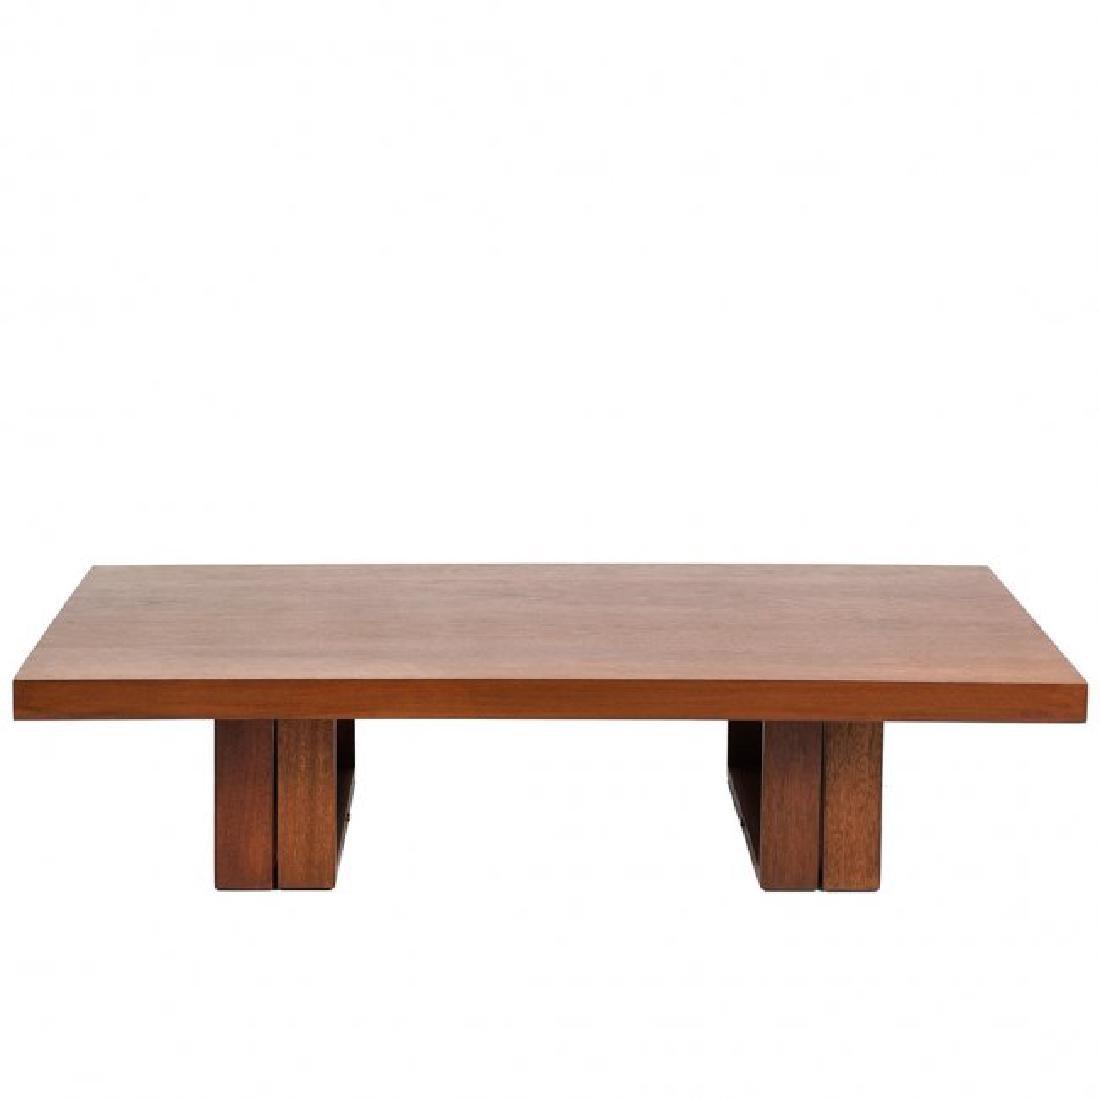 Van Keppel & Green Camel Table